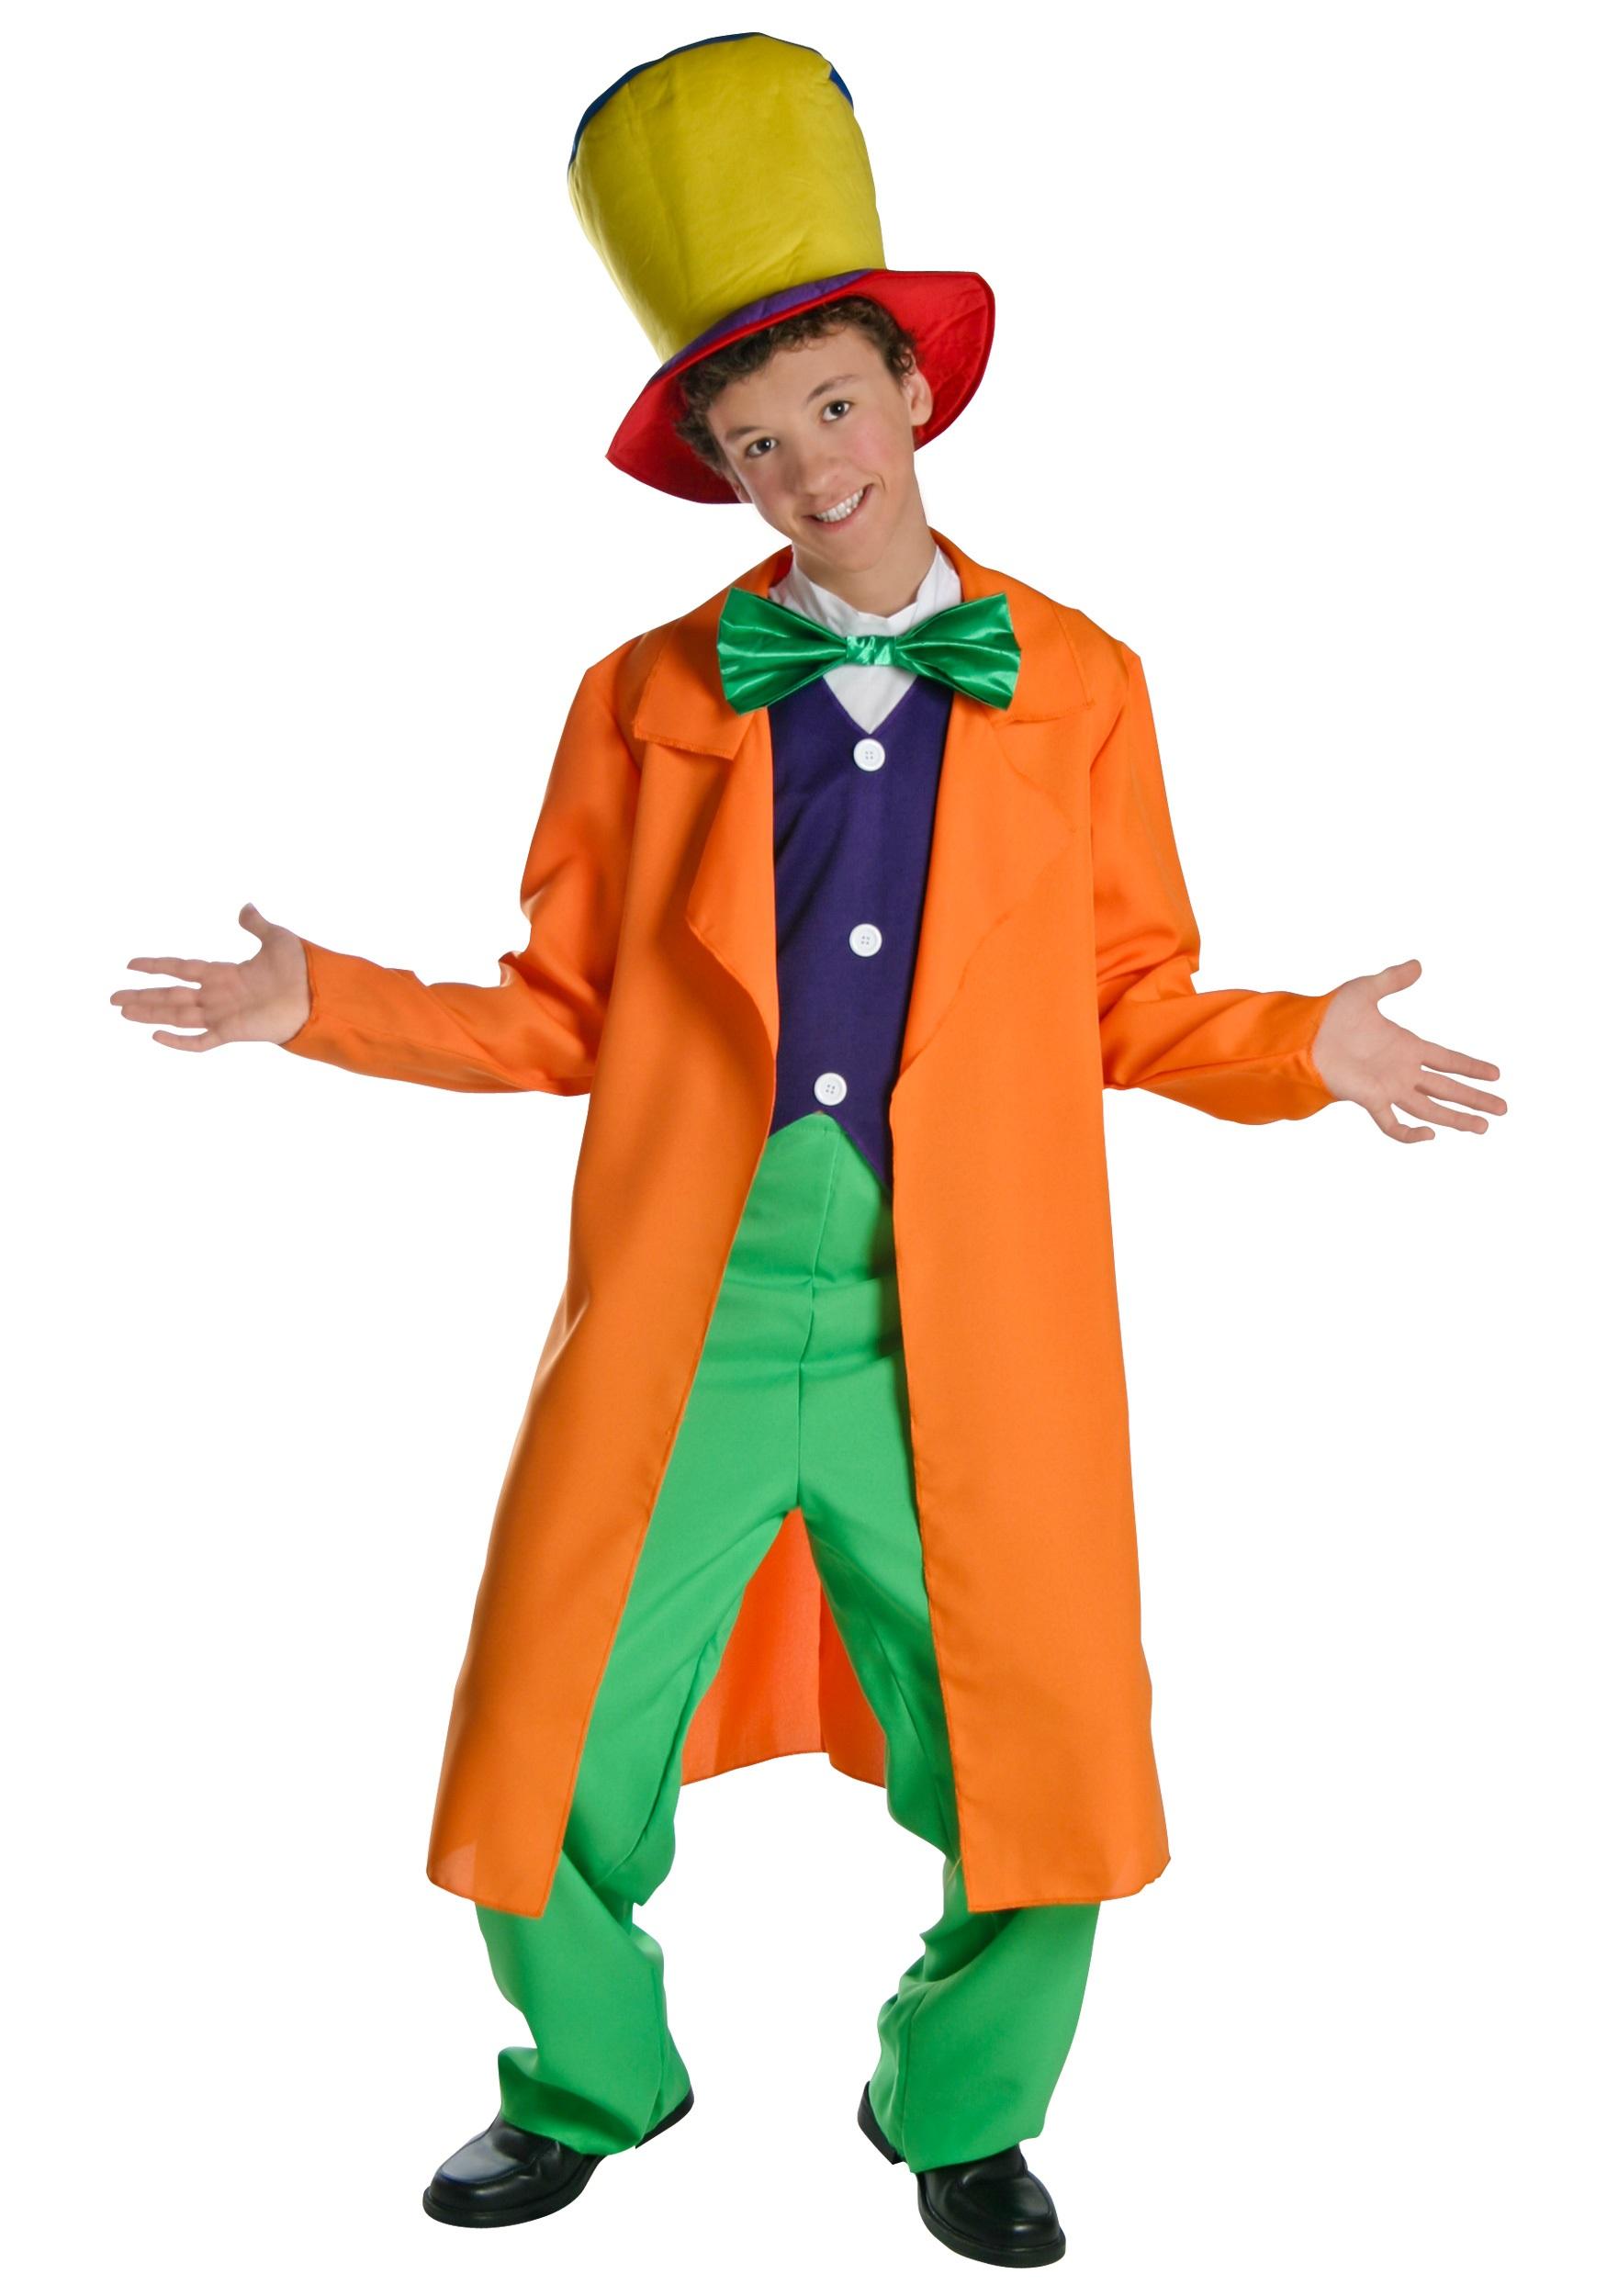 Mad Hatter Teen Costume  sc 1 st  Halloween Costumes & Mad Hatter Teen Costume - Halloween Costumes